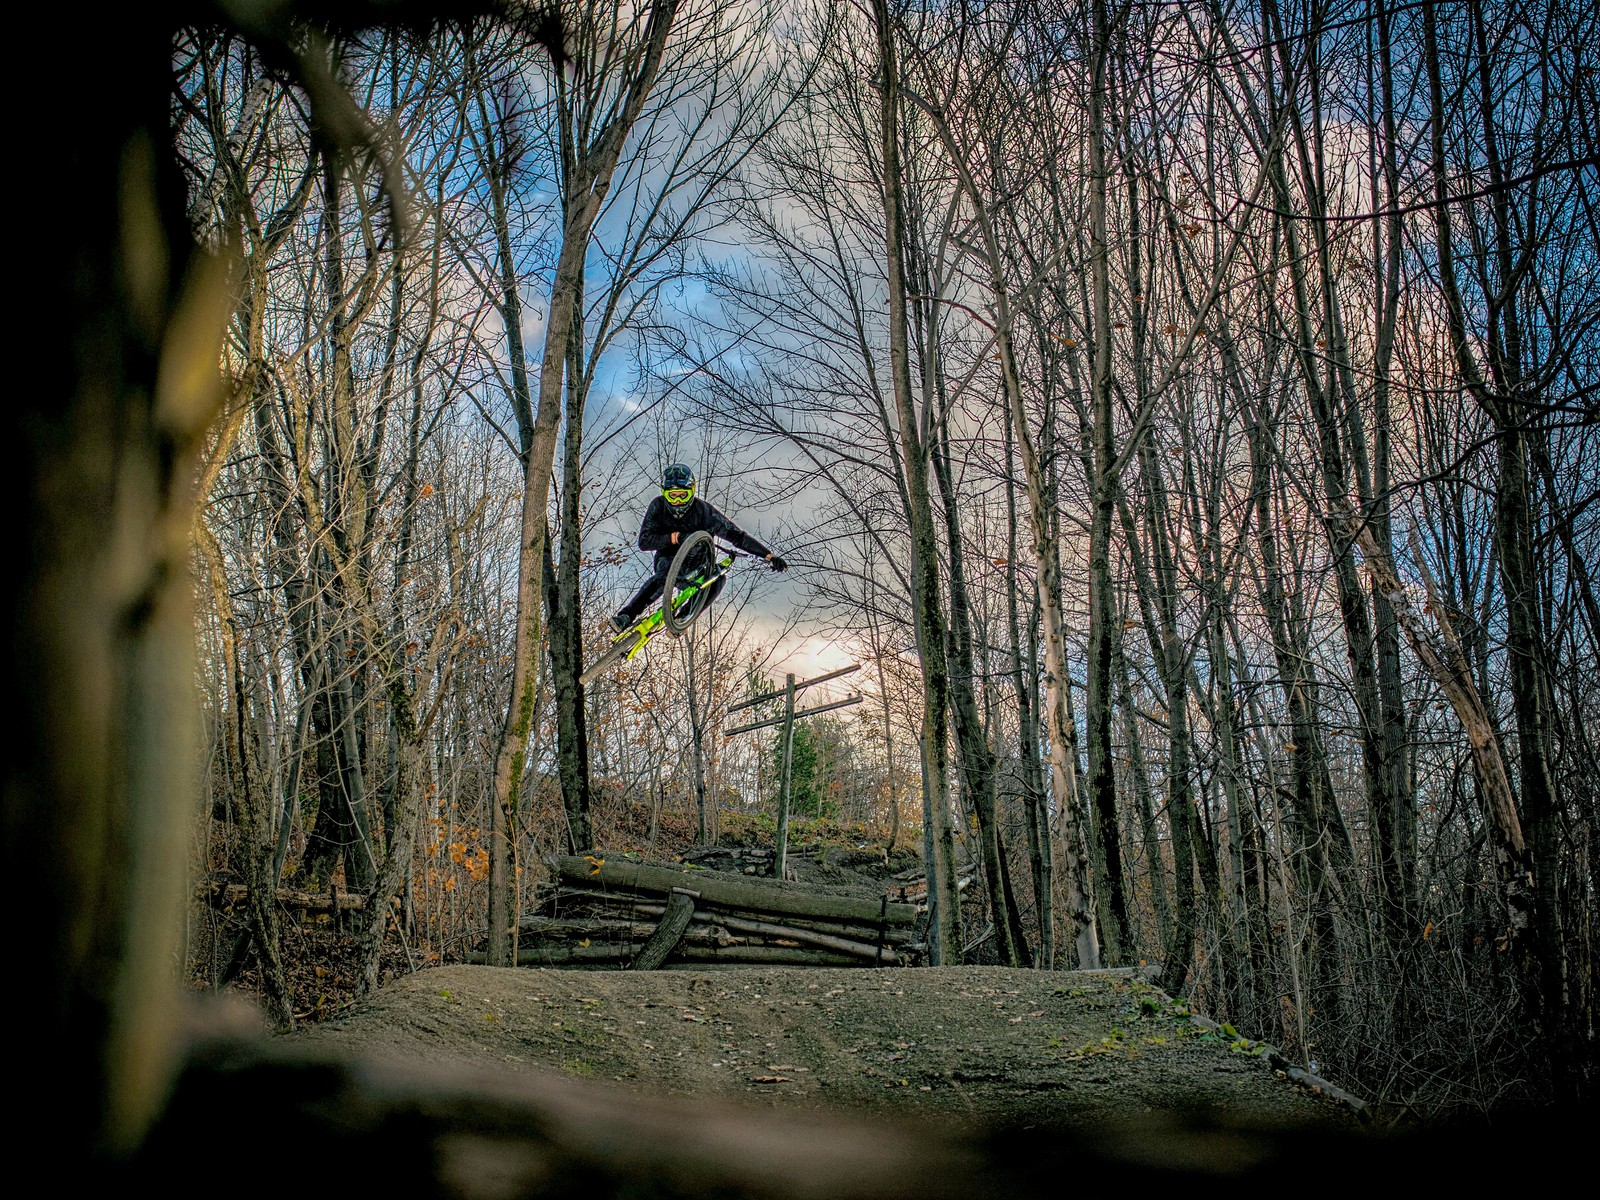 marmota - philippemarceau - Mountain Biking Pictures - Vital MTB